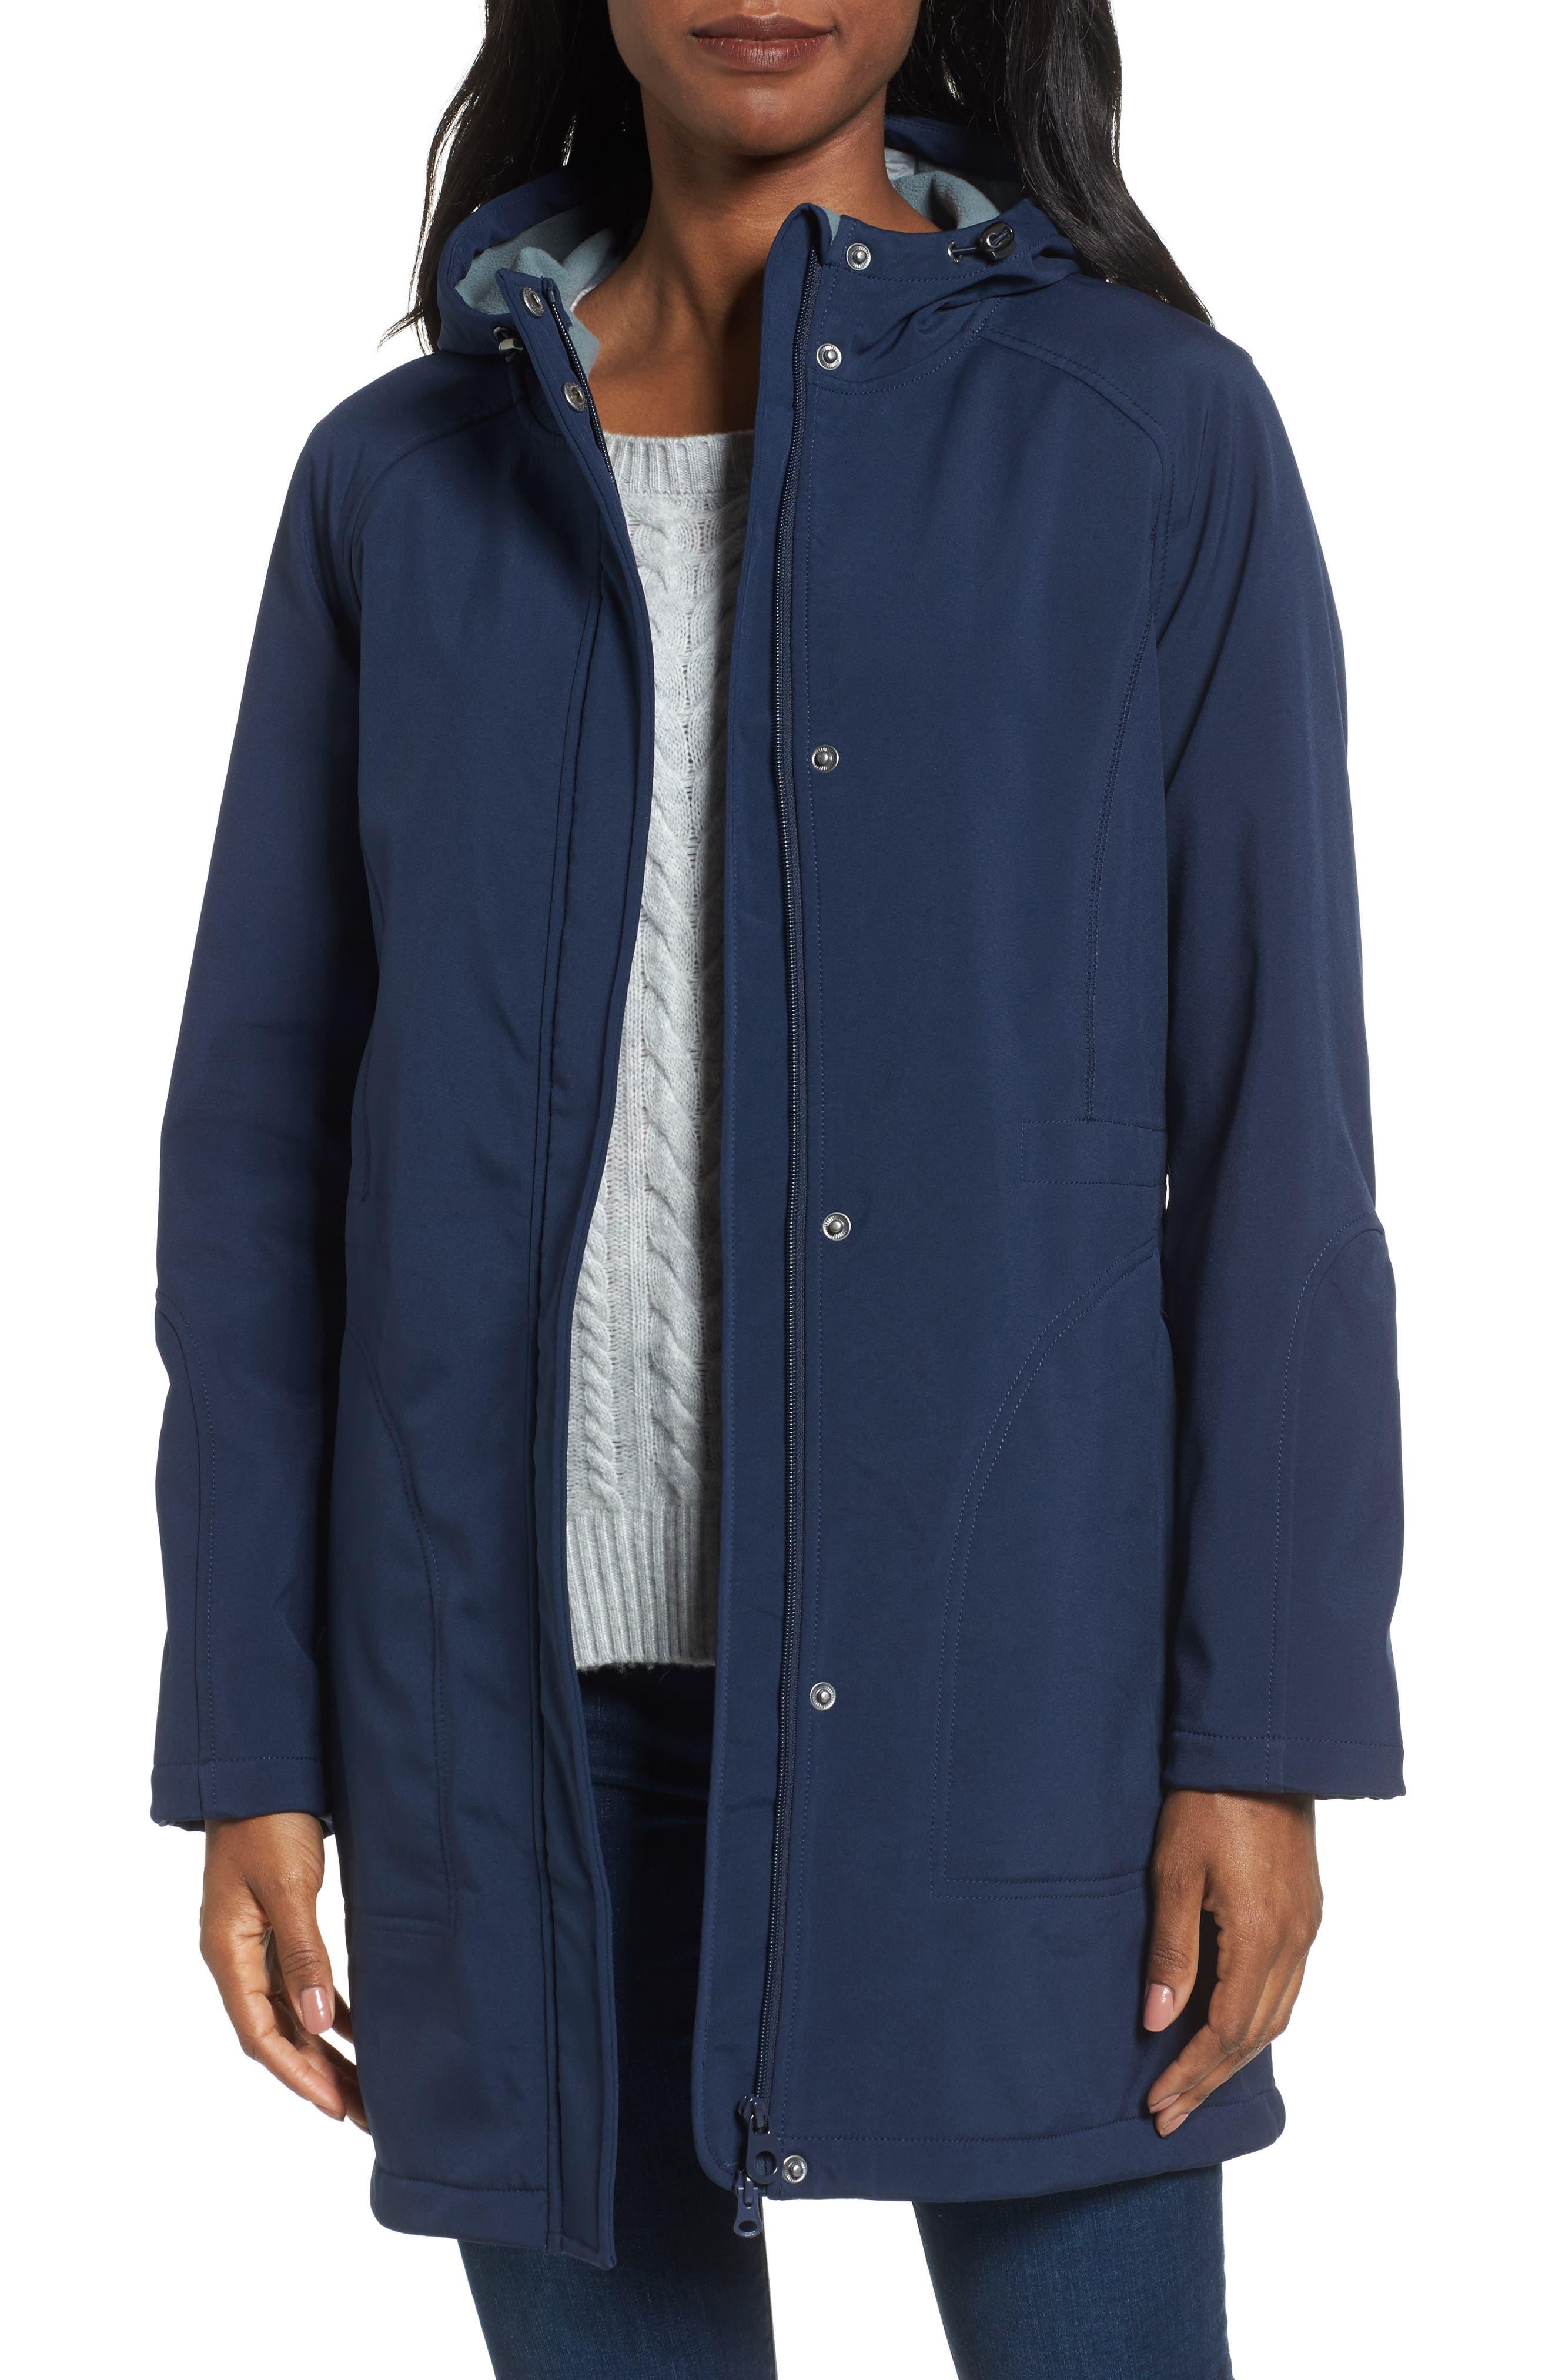 Right as Rain Fleece Lined Raincoat,                         Main,                         color,